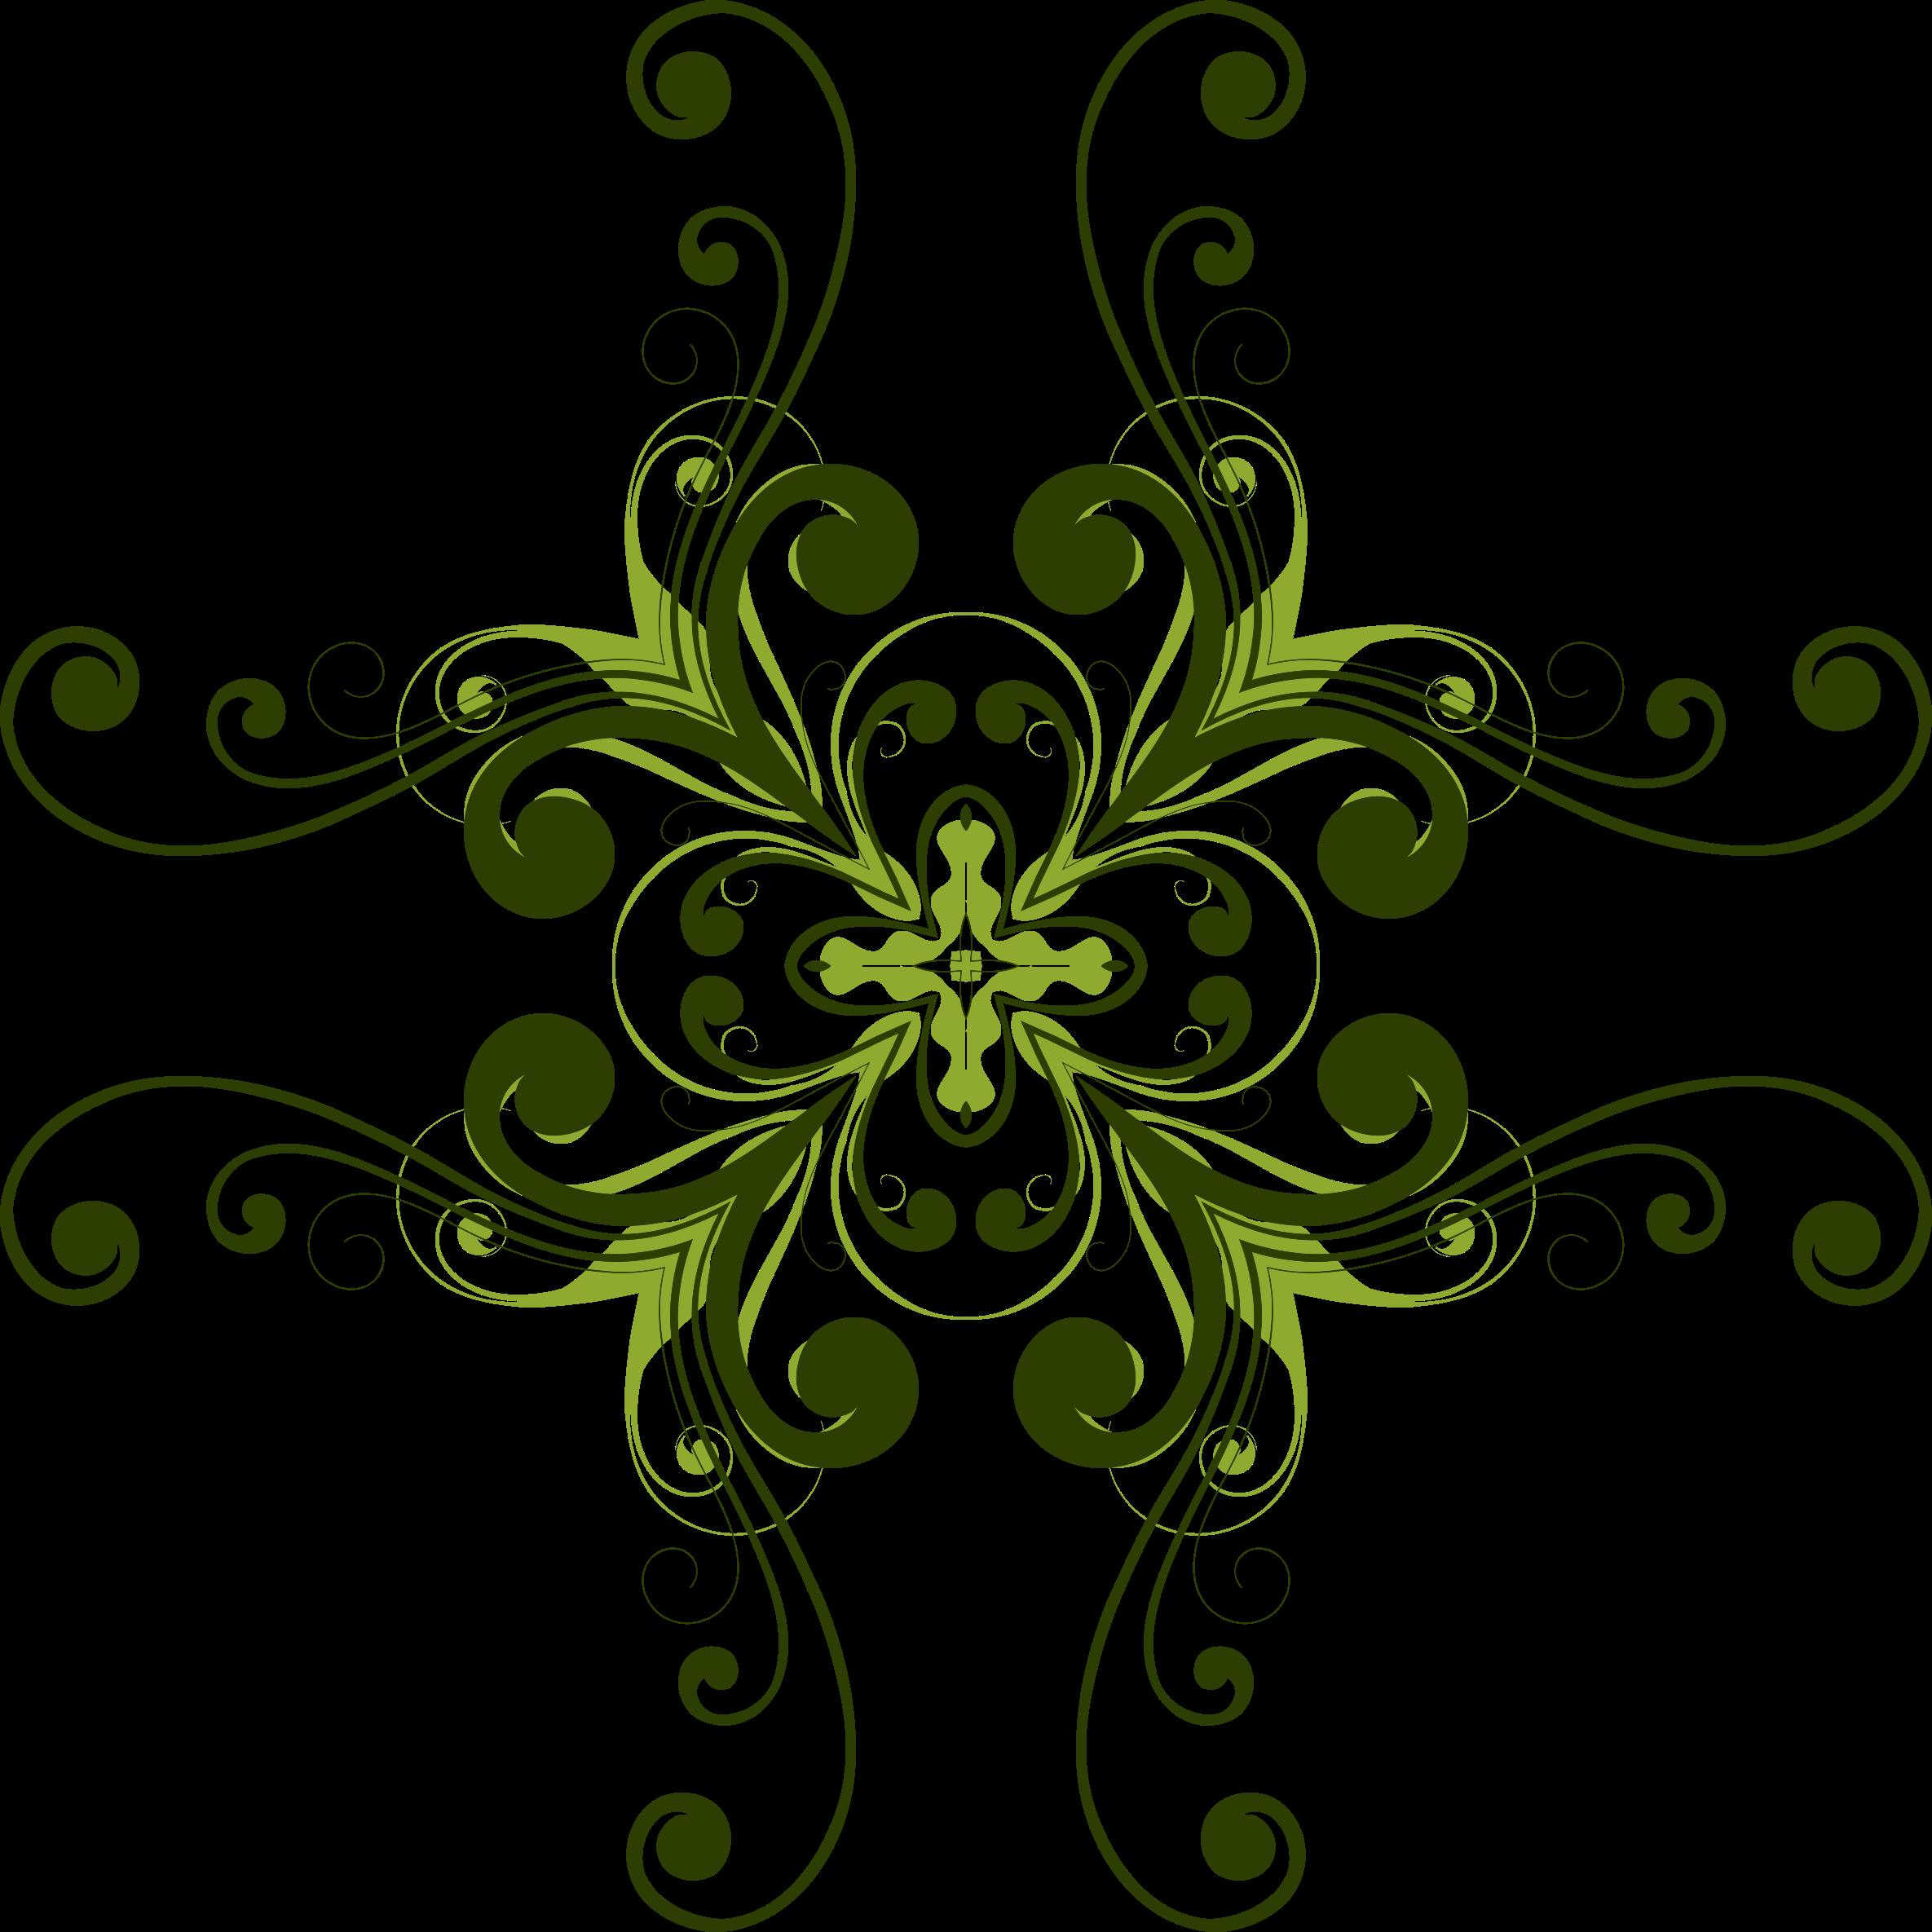 Flower flourish clipart. Design big image png